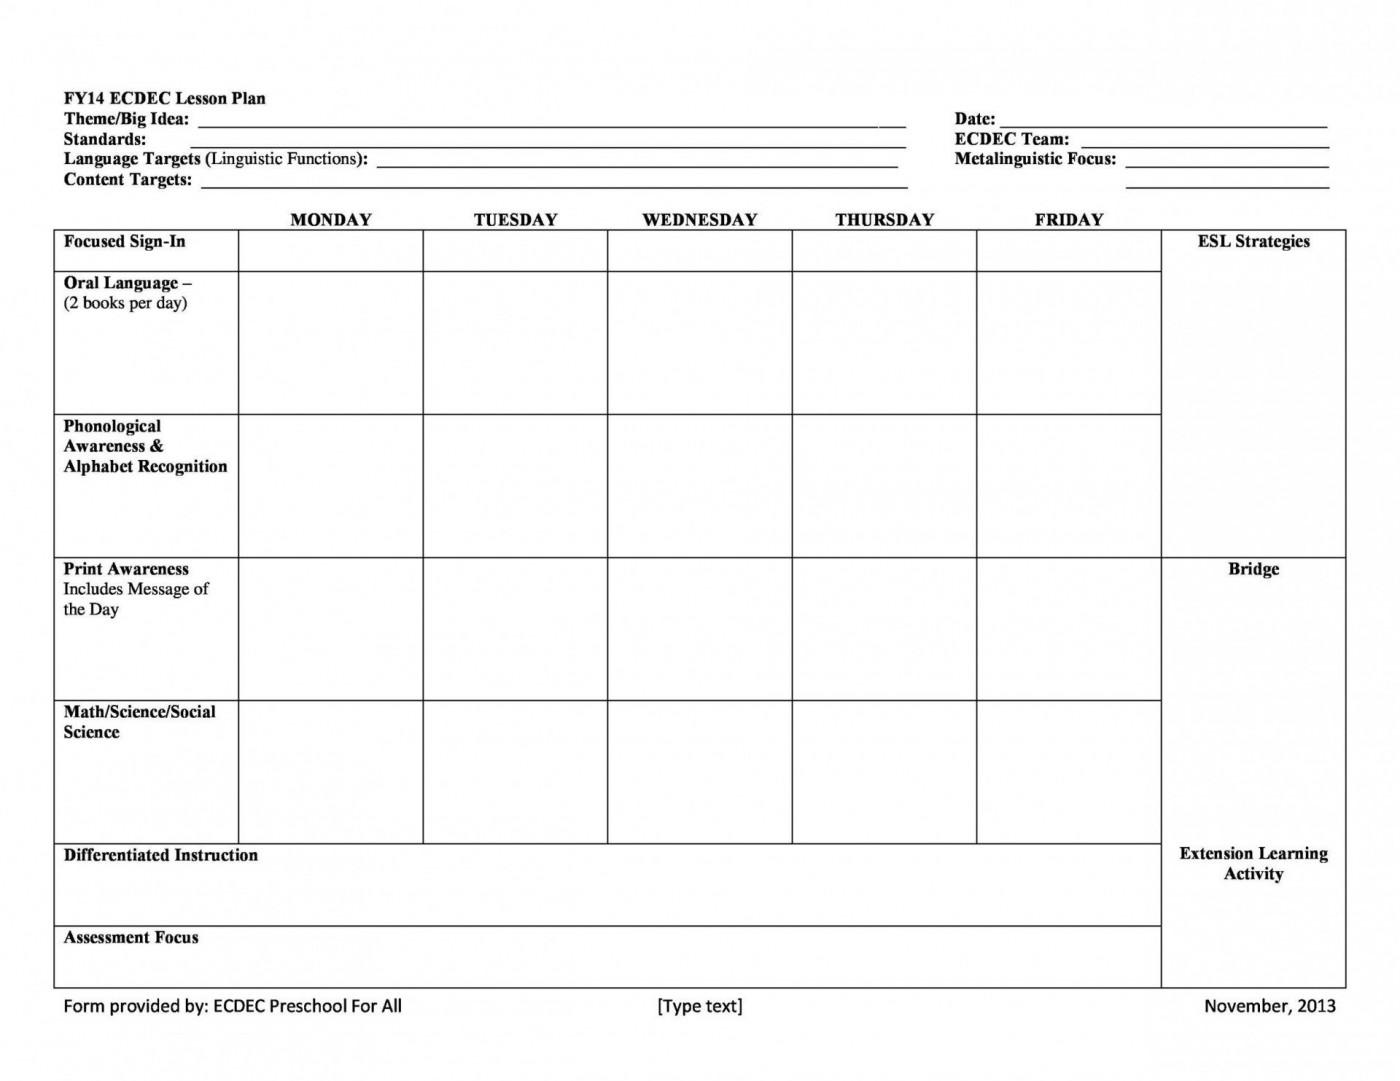 006 Surprising Weekly Lesson Plan Template Editable High Def  Google Doc Preschool Downloadable Free1400